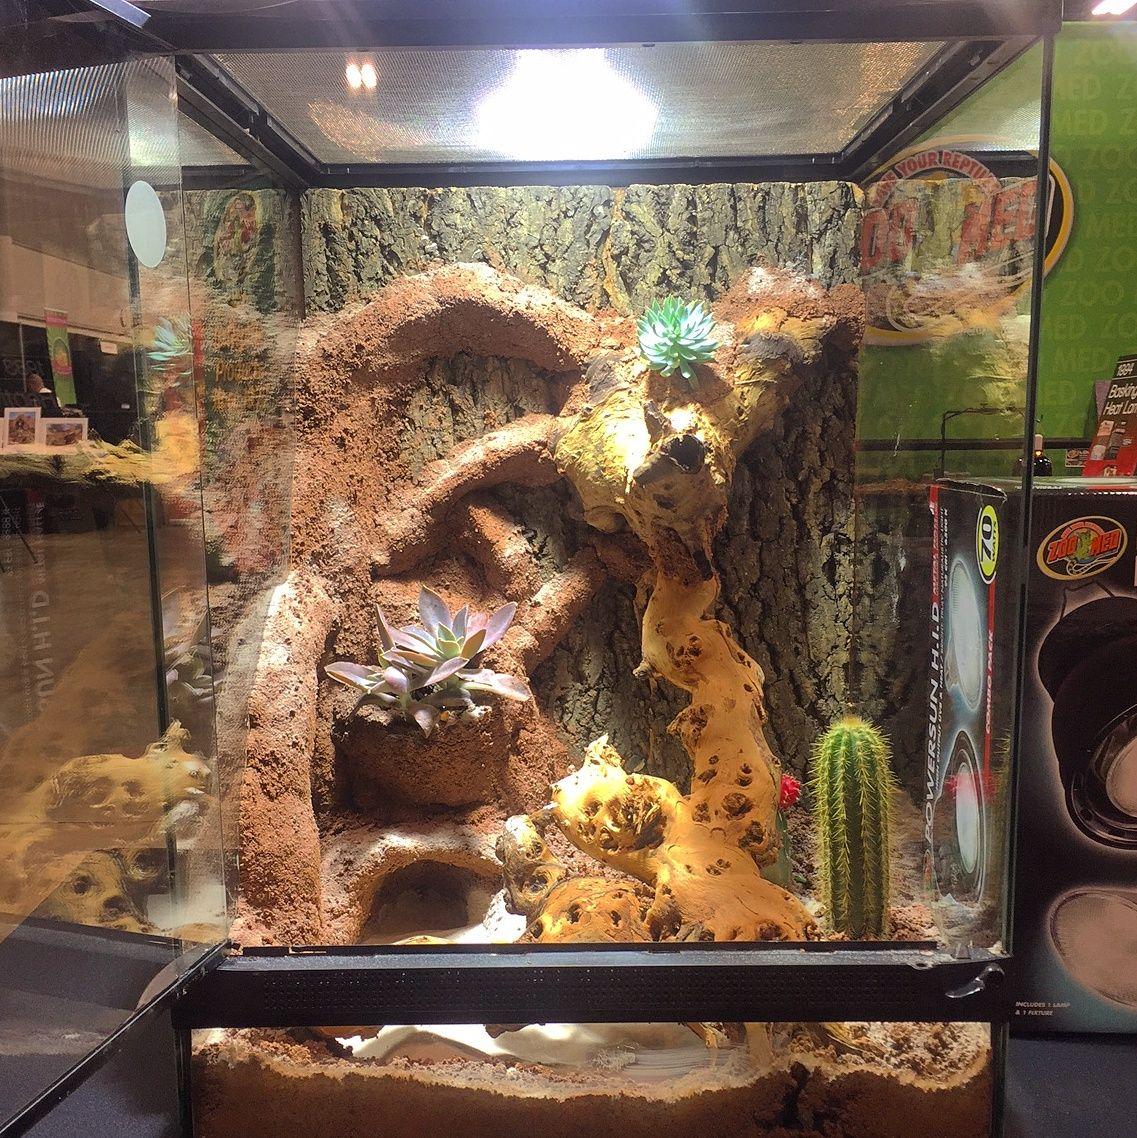 Clay Cool Seamonkey Habitats